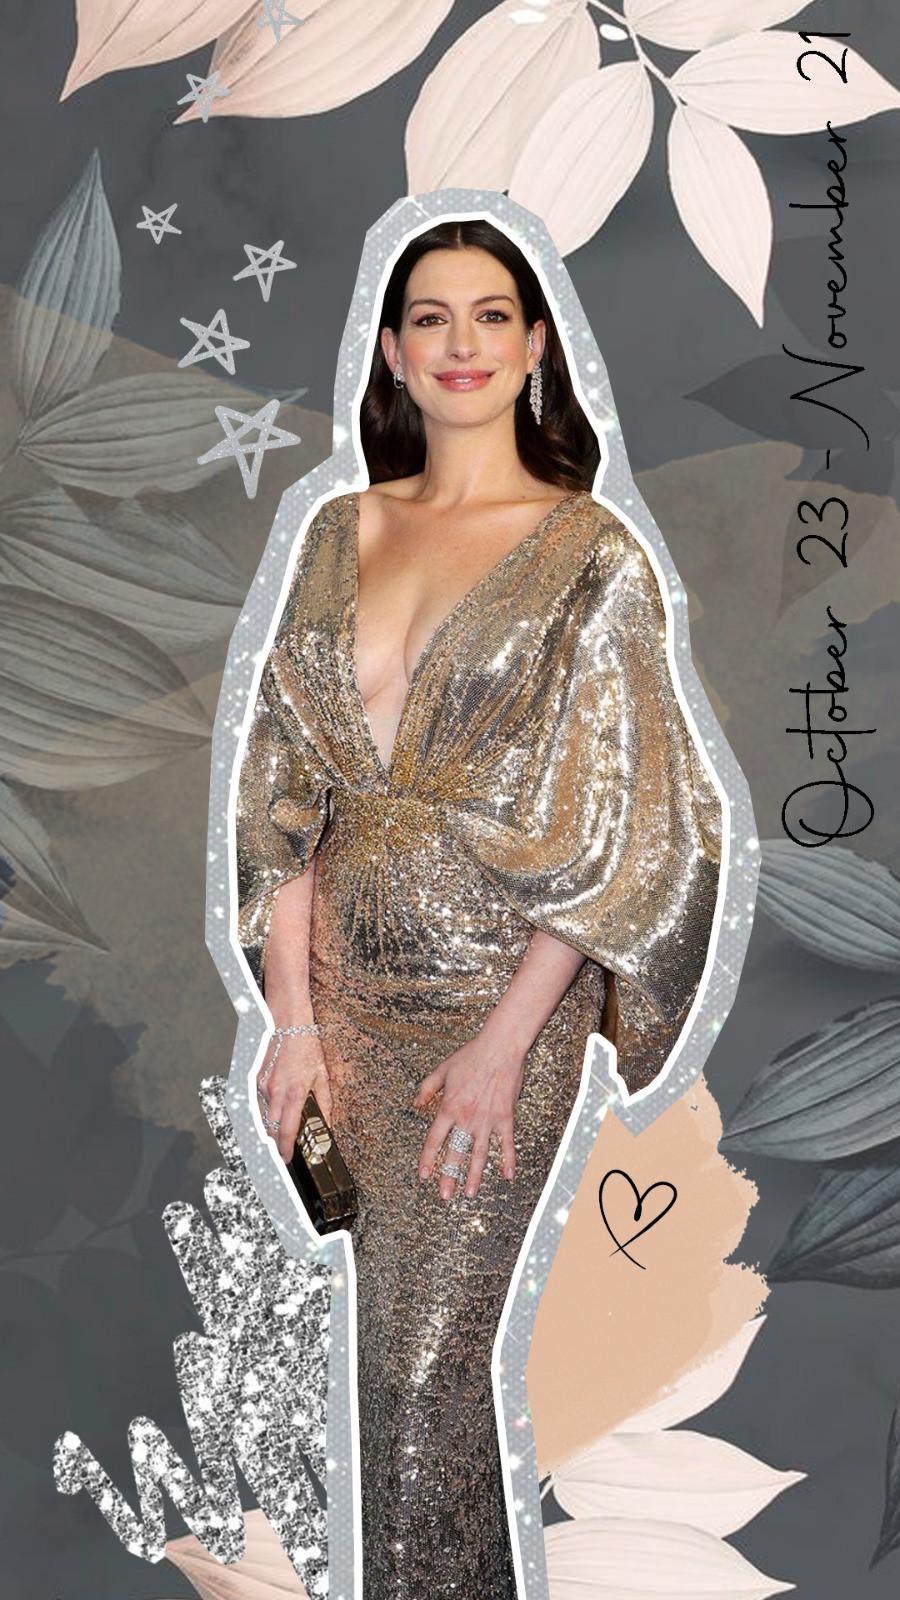 Anne Hathaway image via John Salangsang/Shutterstock